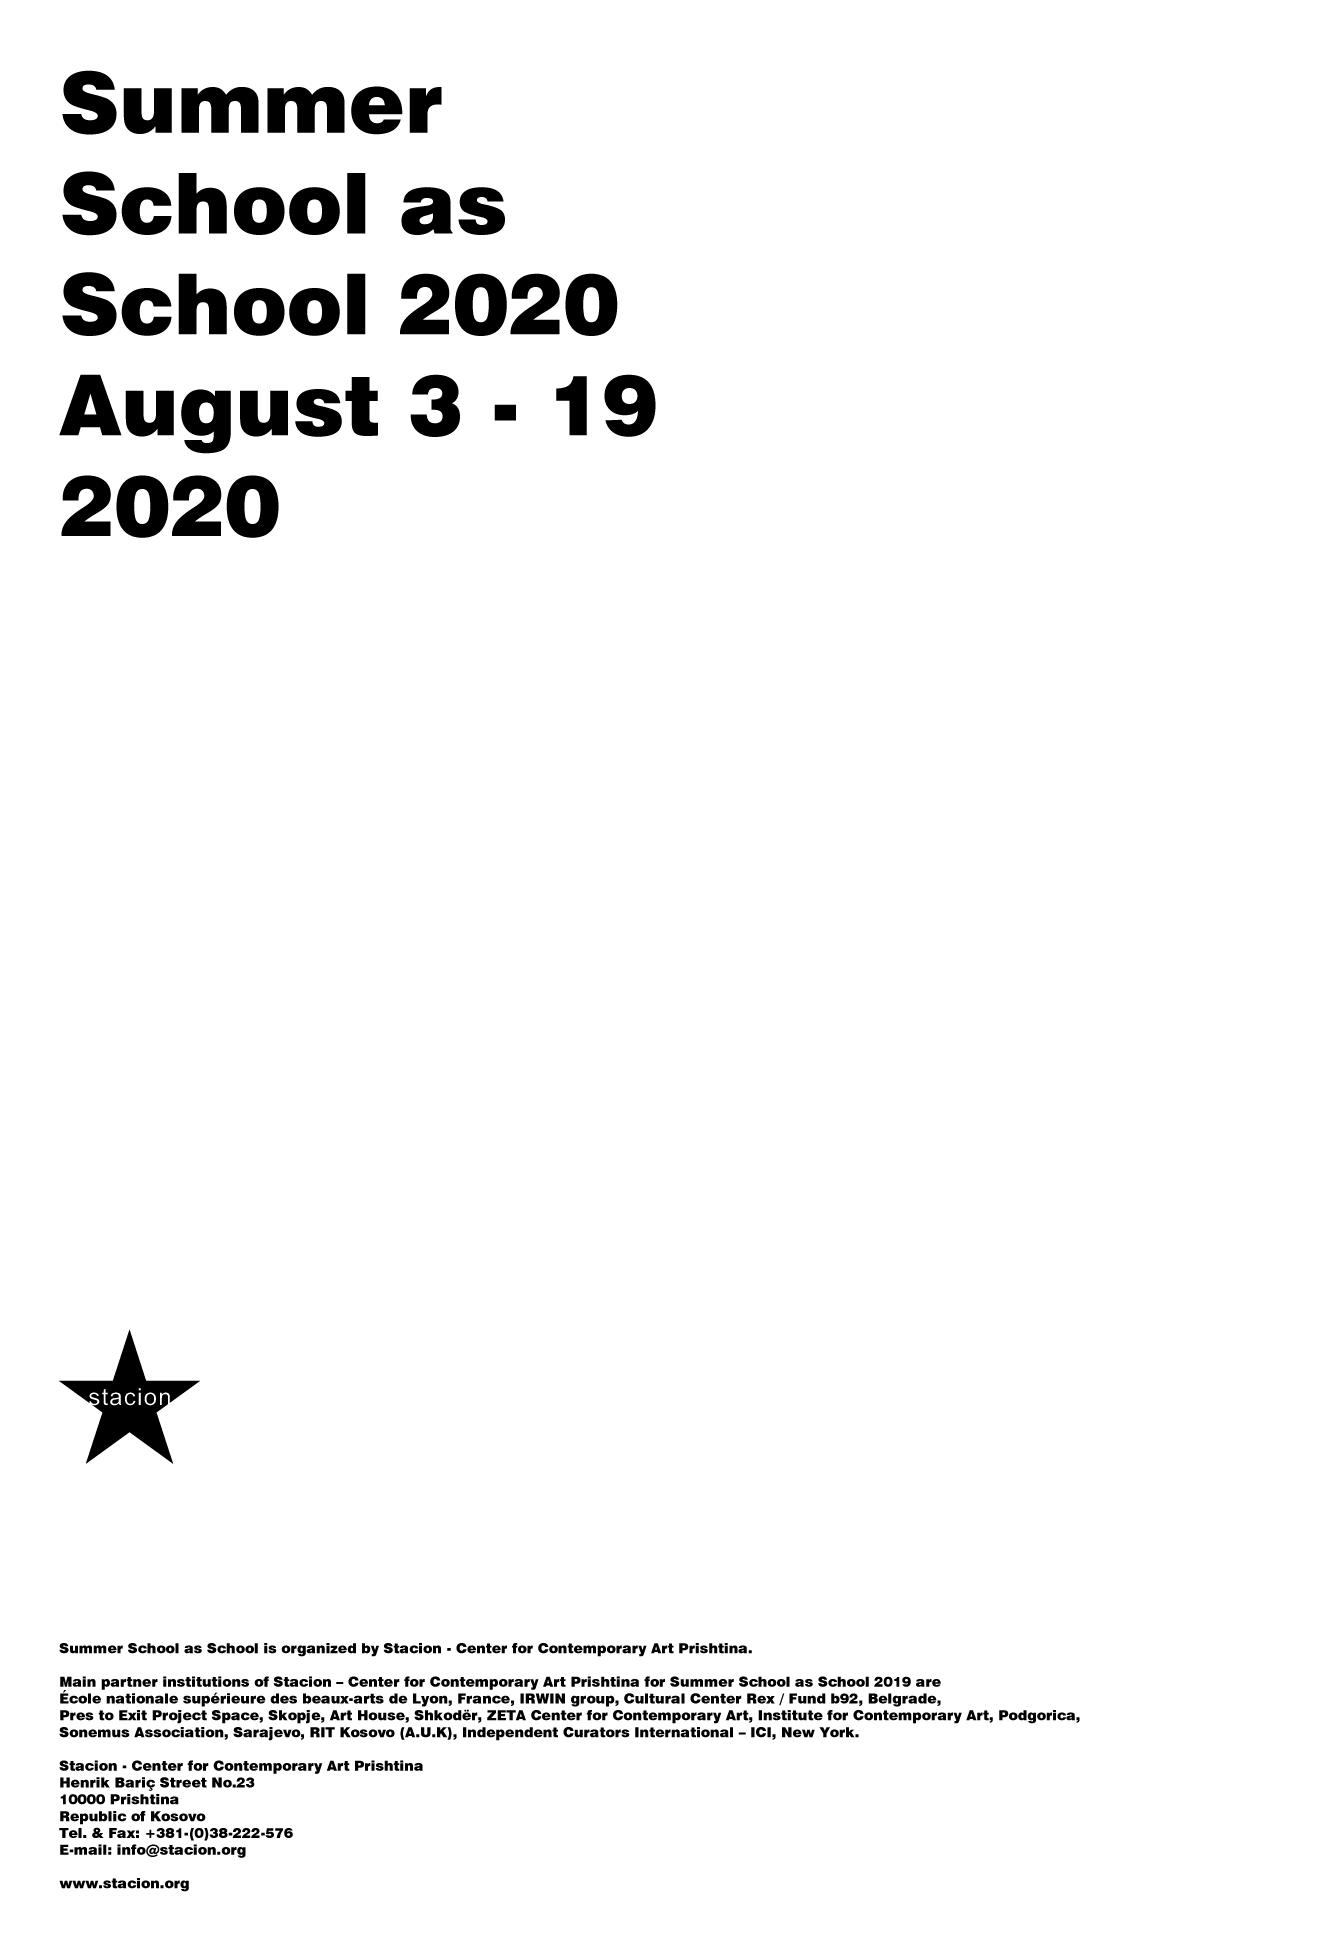 Summer School as School 2020